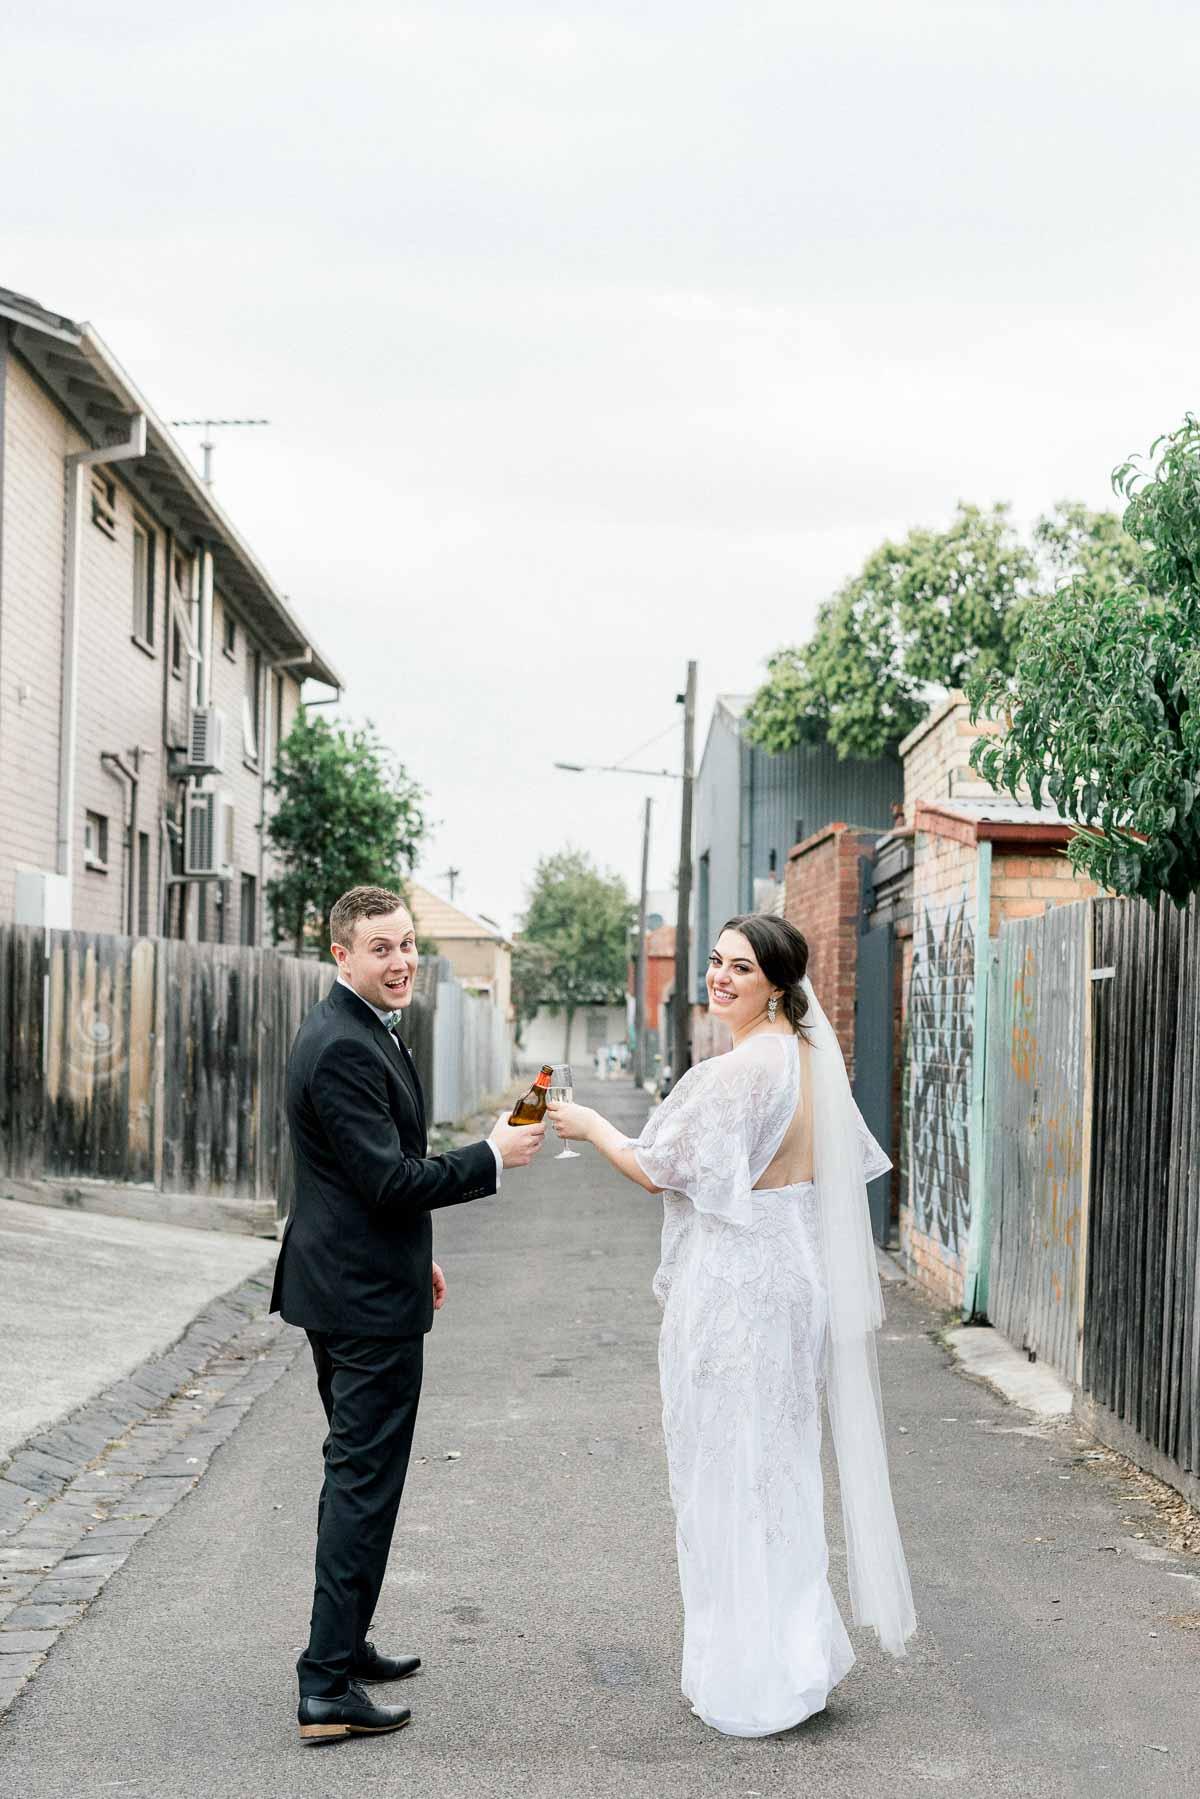 little-henri-cafe-wedding-thornbury-heart+soul-weddings-jane-aaron-05812.jpg